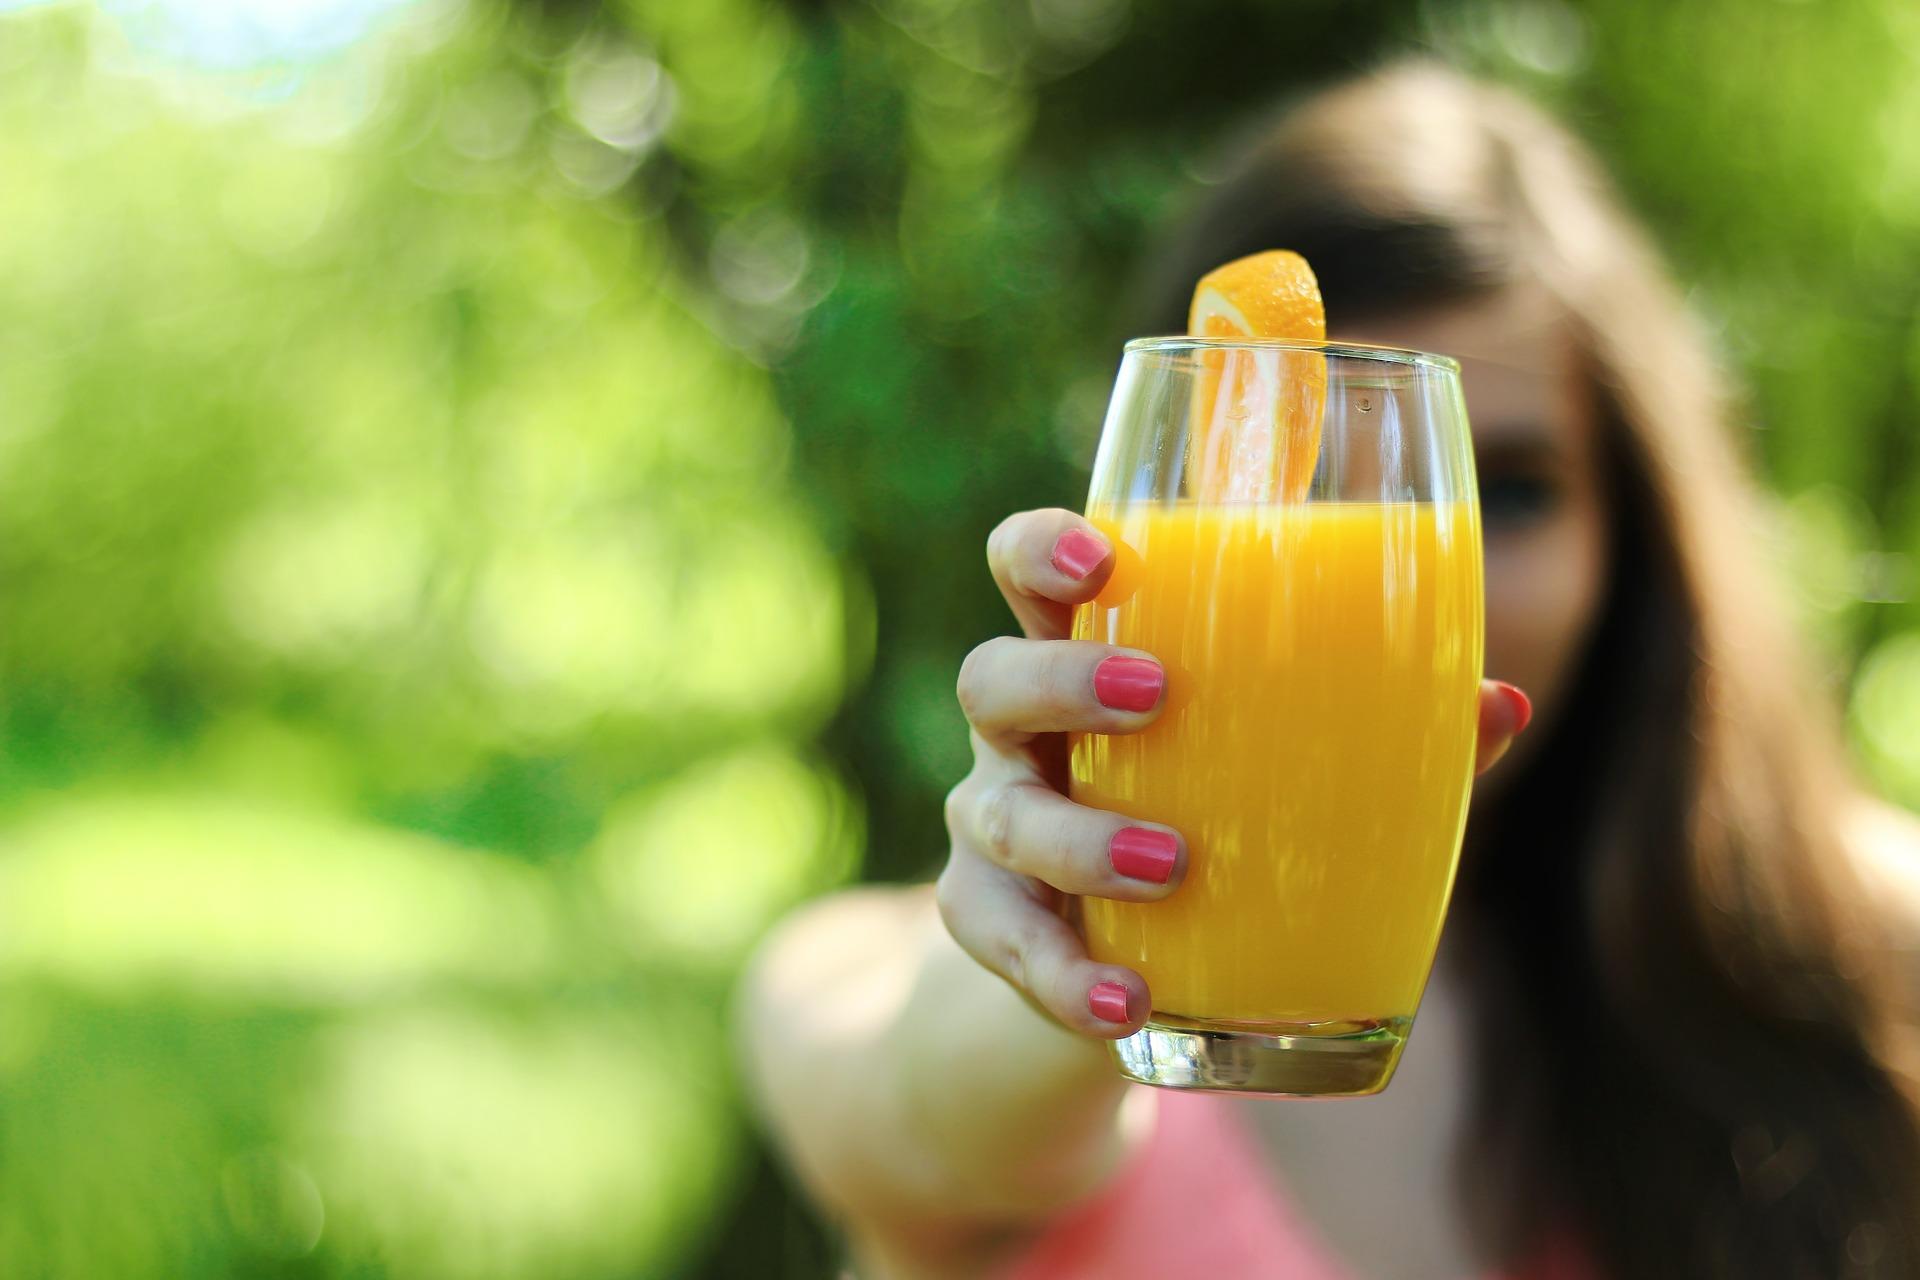 Frau hält Glas mit Orangensaft in Kamera